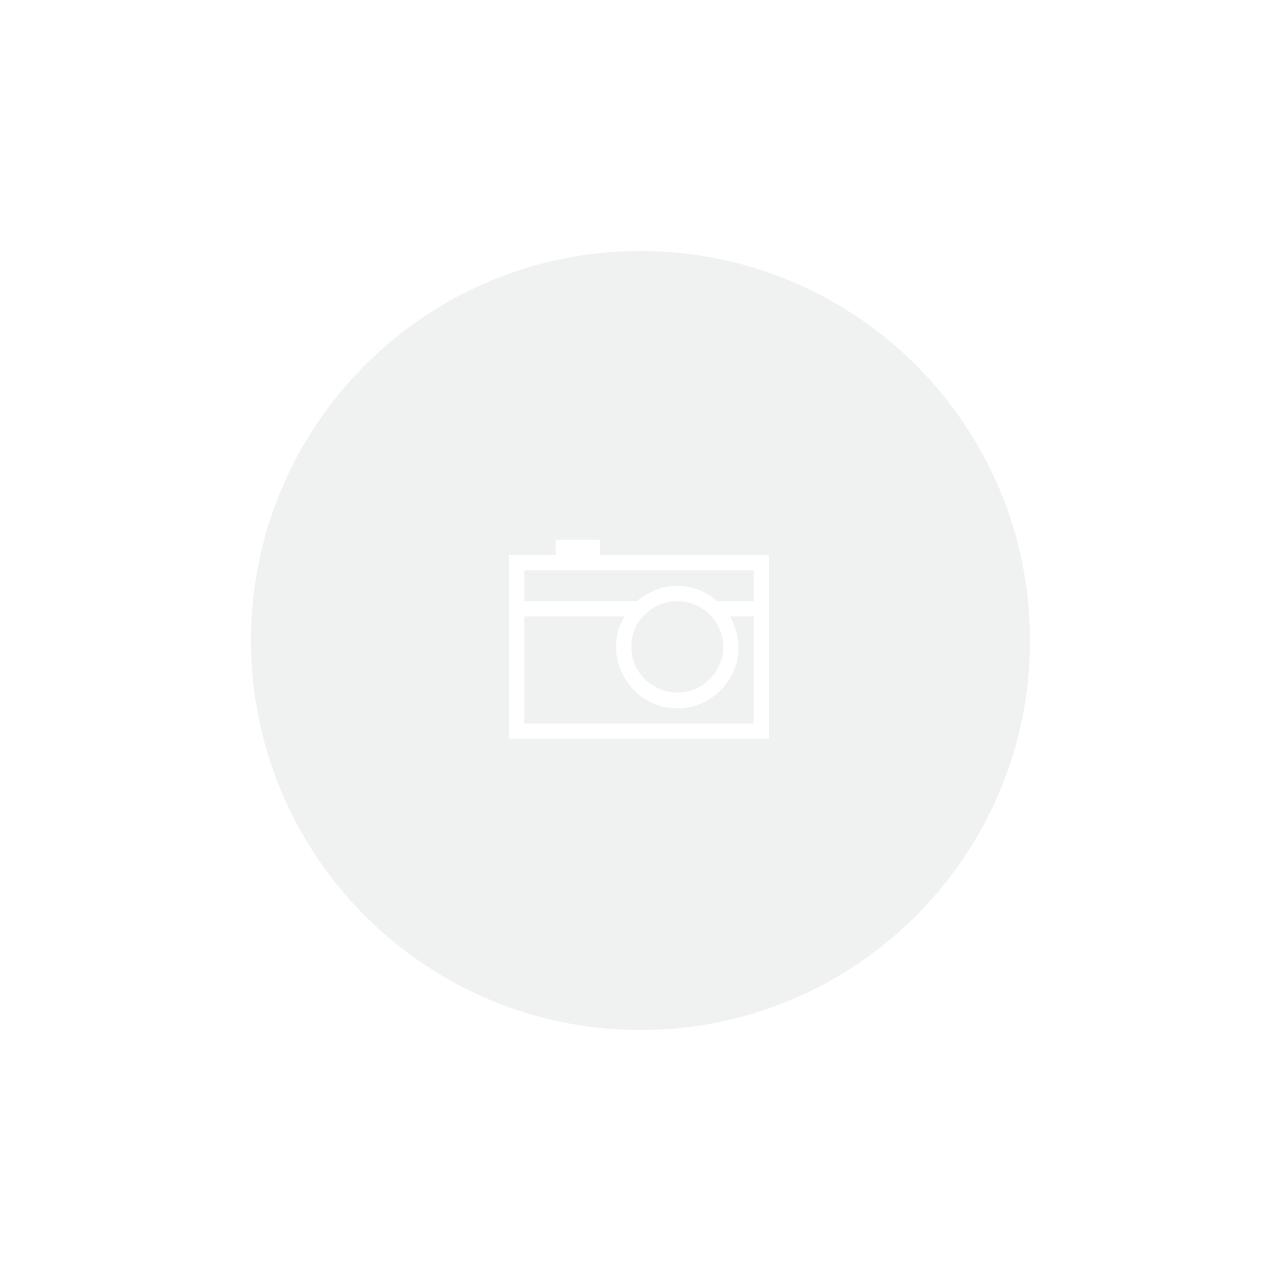 Papel Artesanal Indiano - Ref. 28